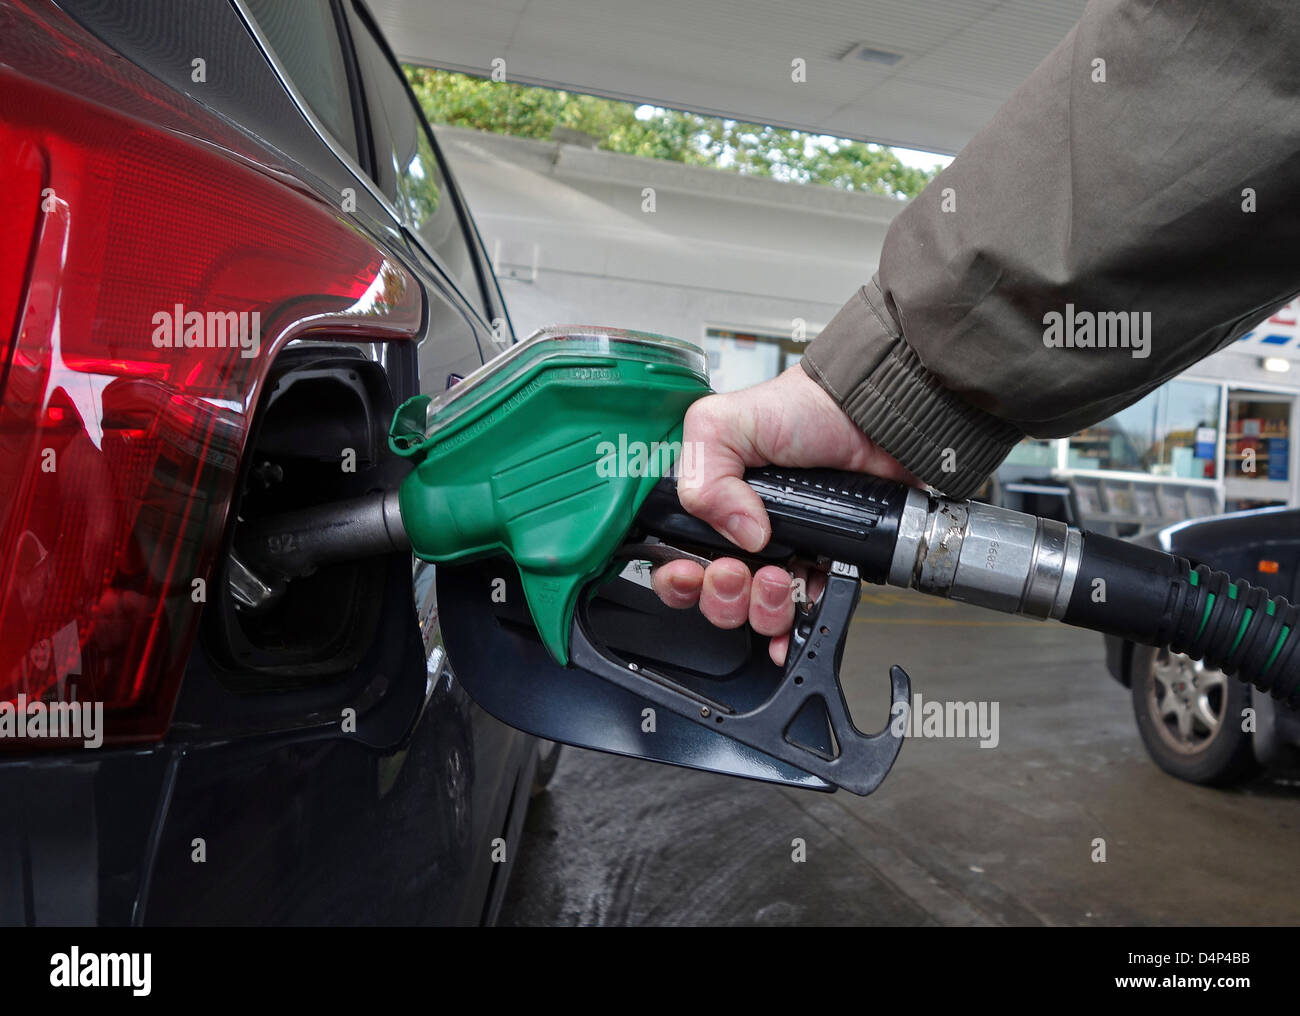 Man using petrol pump at petrol station, uk - Stock Image